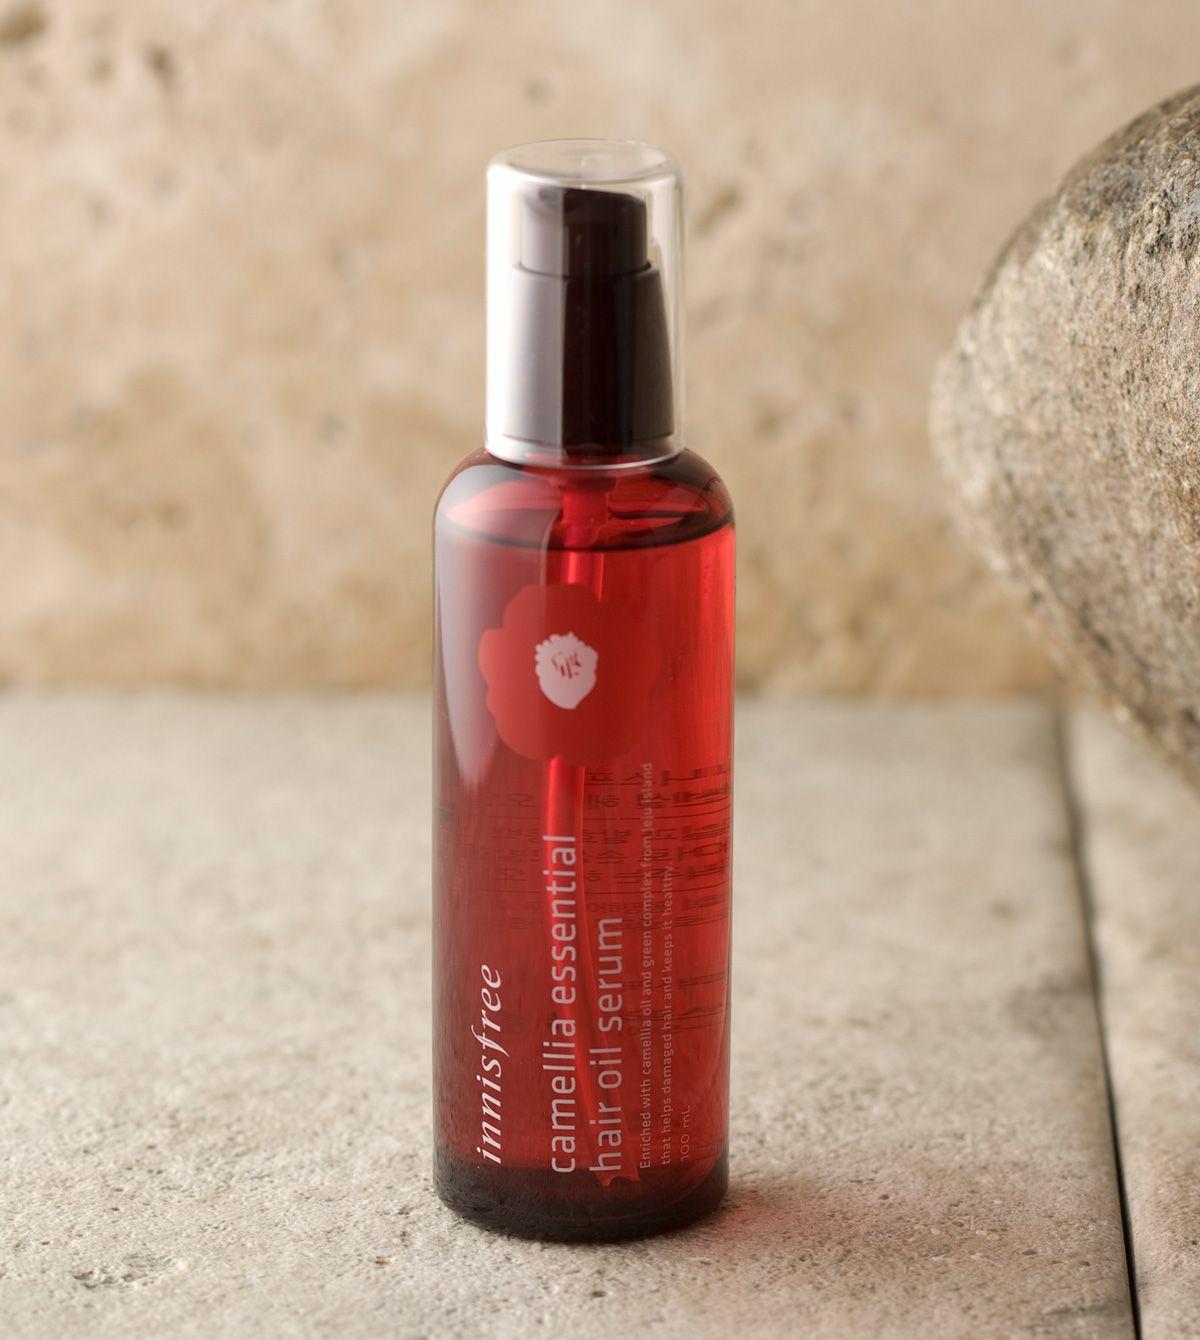 Camellia essential hair oil serum蕴含济州岛山茶花精油与发酵山茶精油,给予损伤